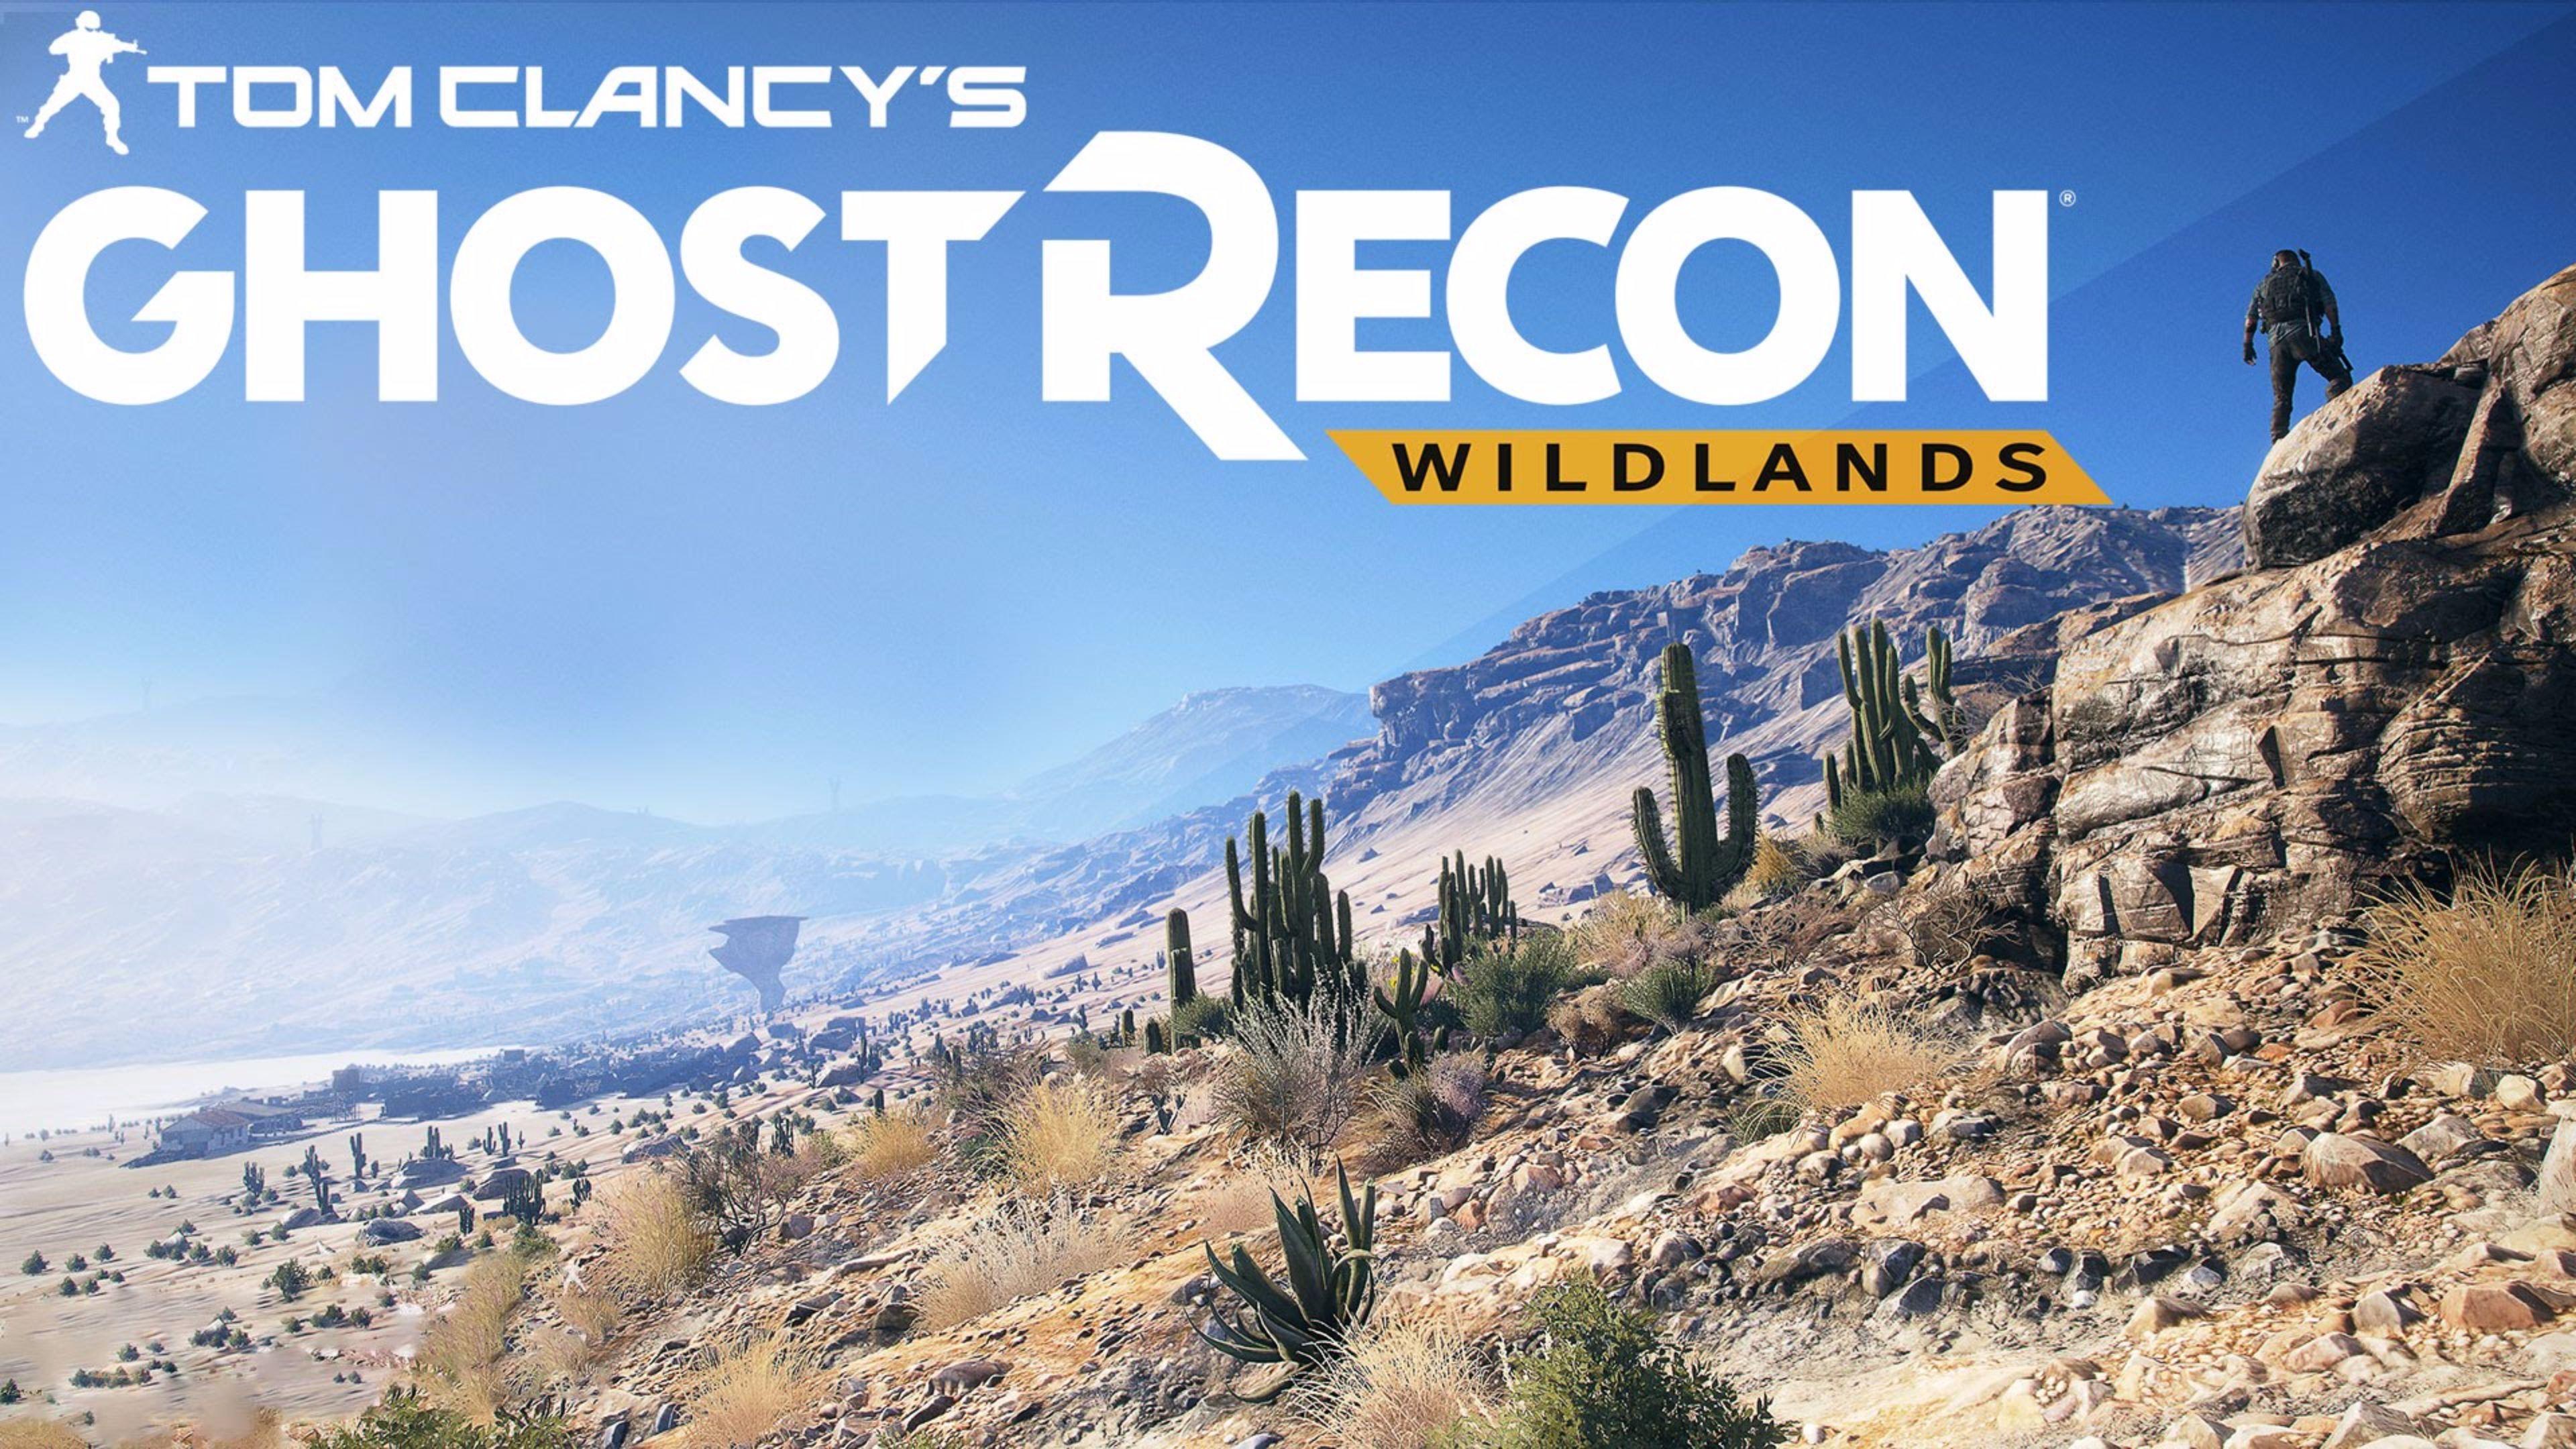 32 4k Ultra Hd Tom Clancy S Ghost Recon Wildlands Wallpapers